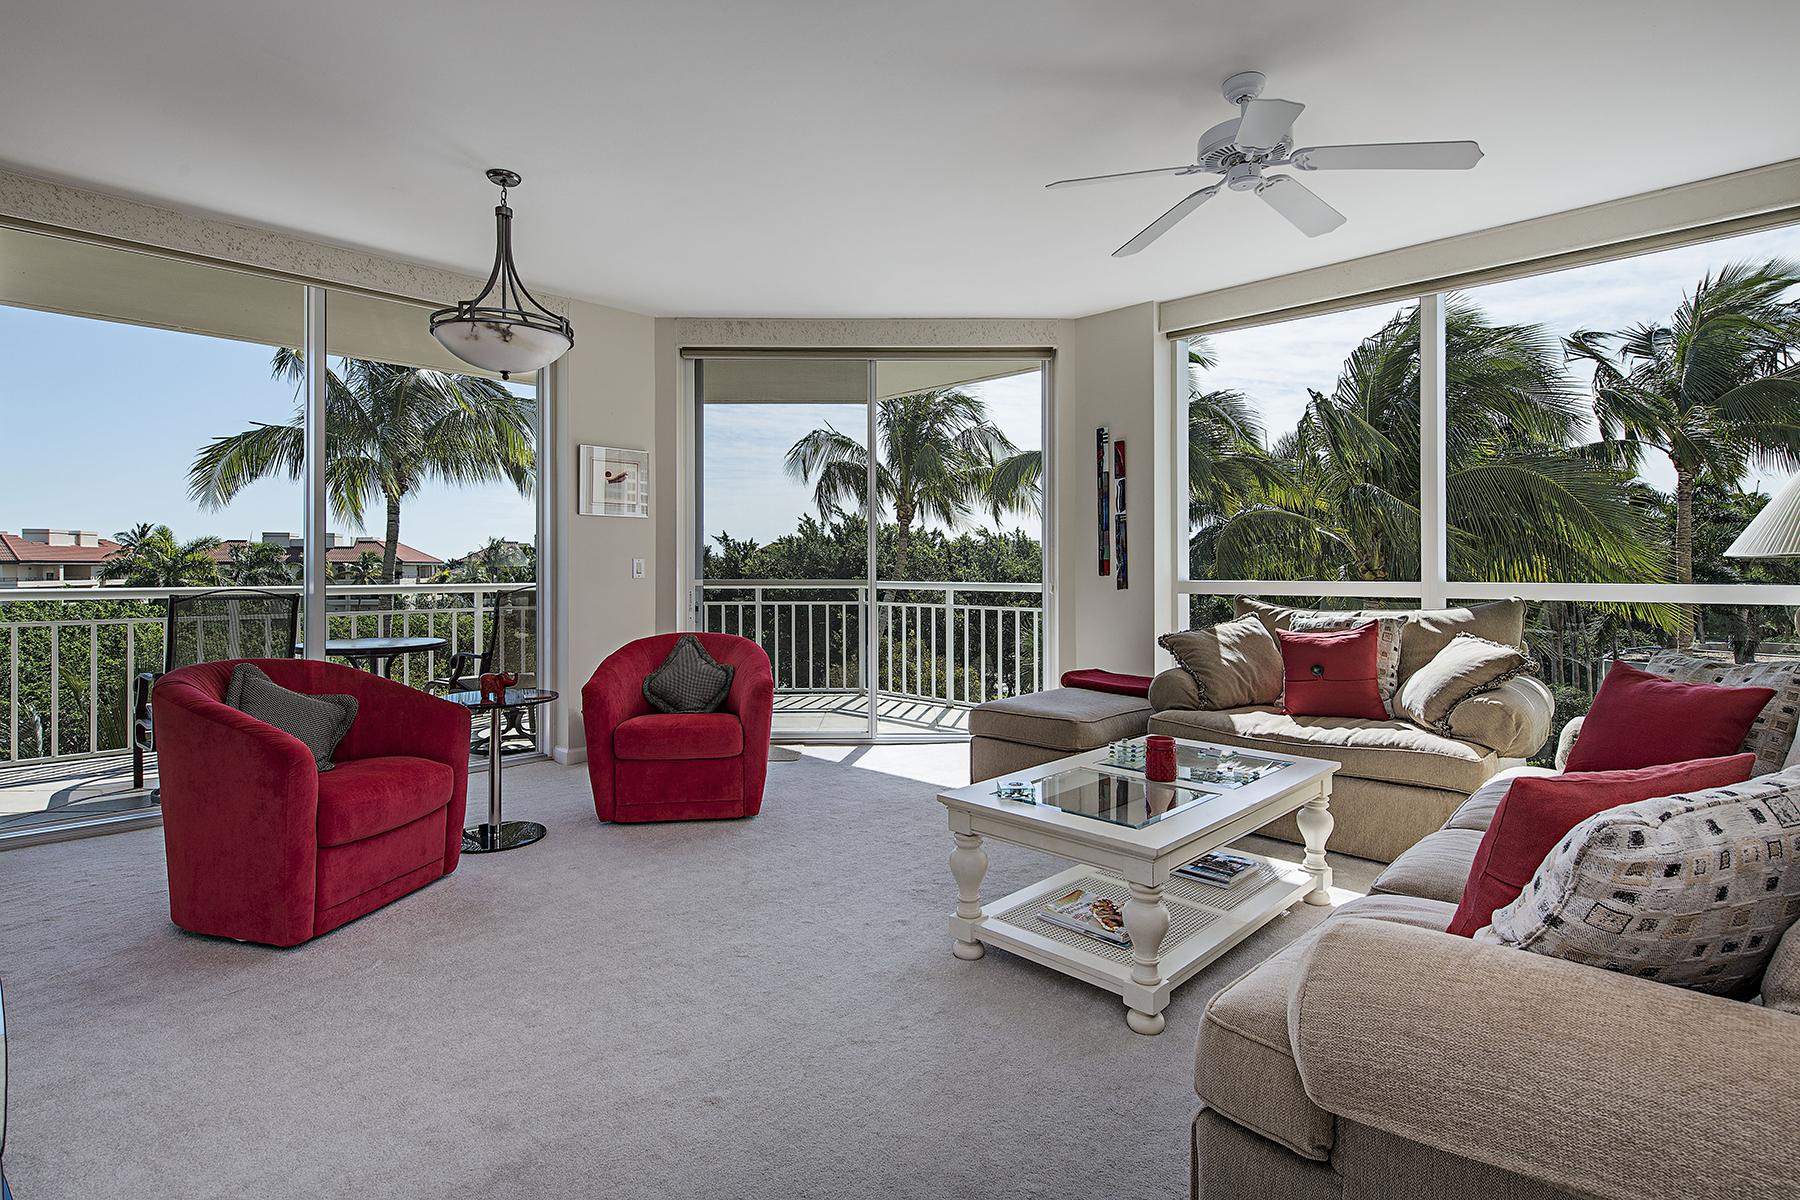 共管物業 為 出售 在 PARK SHORE - BAY SHORE PLACE 4255 Gulf Shore Blvd N 202 Naples, 佛羅里達州, 34103 美國